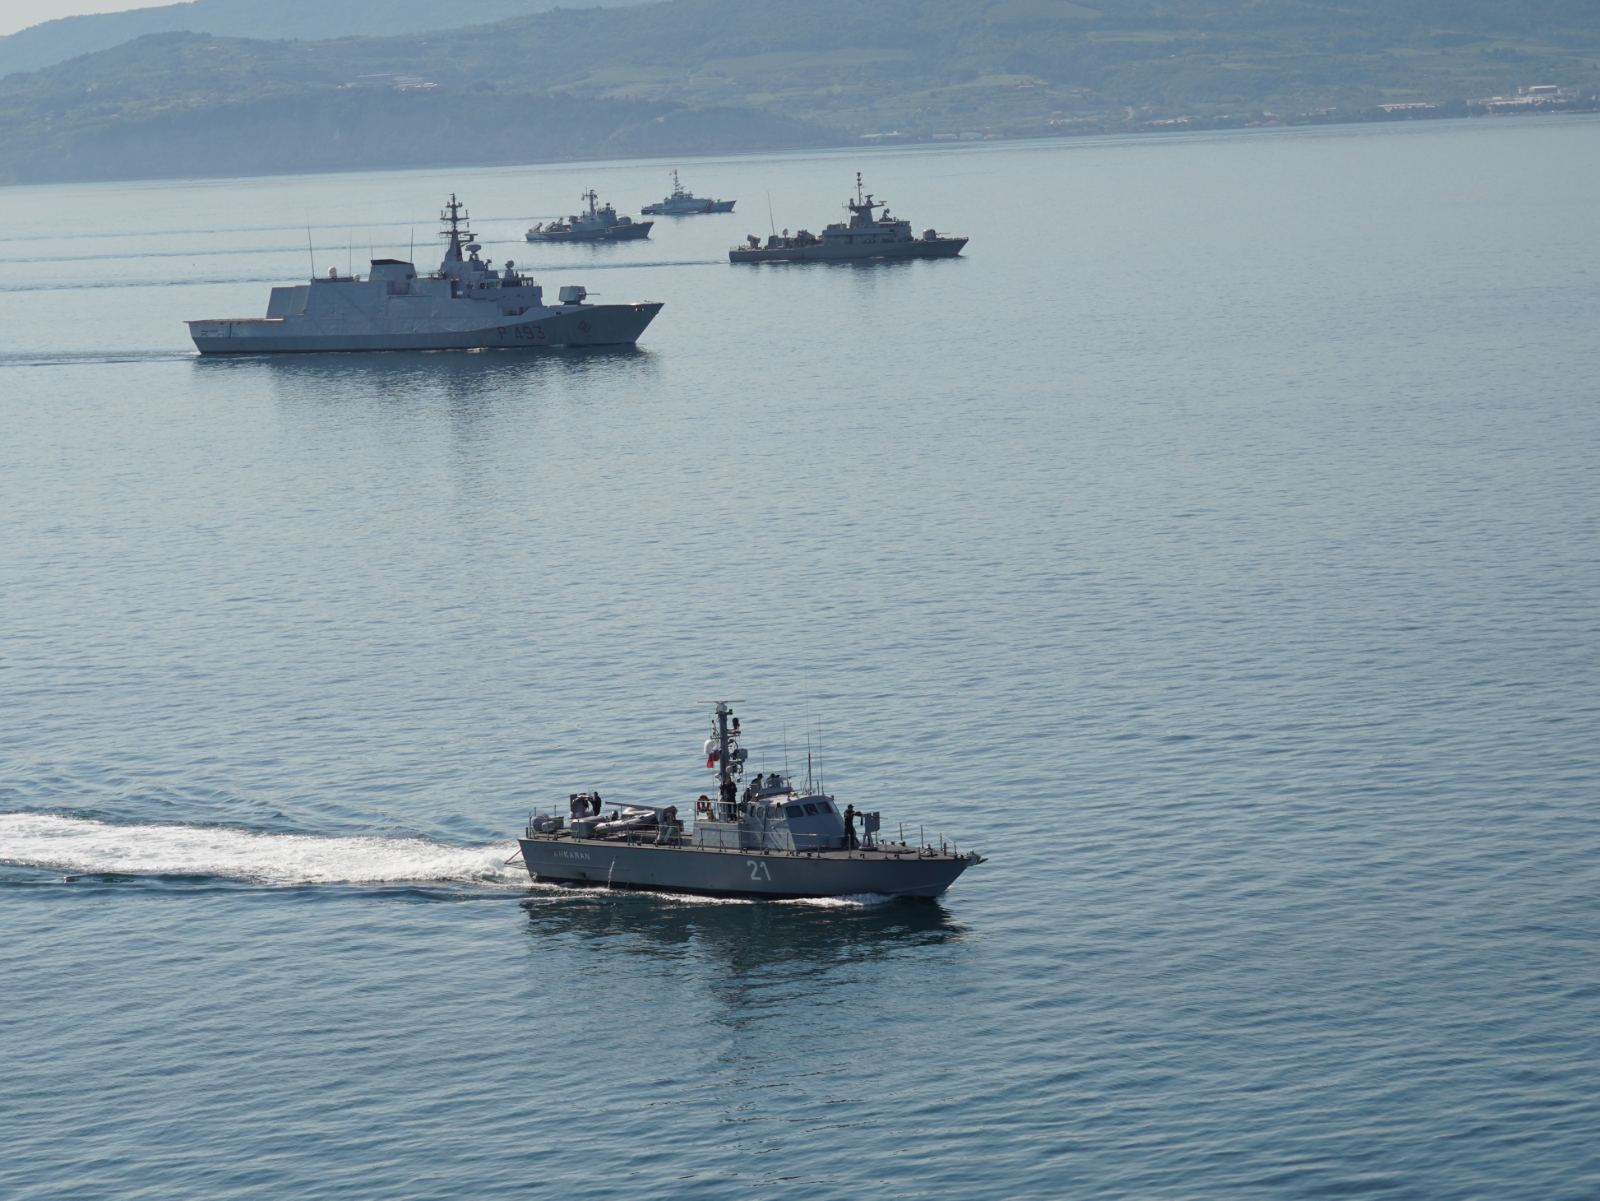 «Adrion Livex 2021»: Έλαμψε η ελληνική πυραυλάκατος «ΡΟΥΣΣΕΝ» στην πολυεθνική άσκηση [pics]